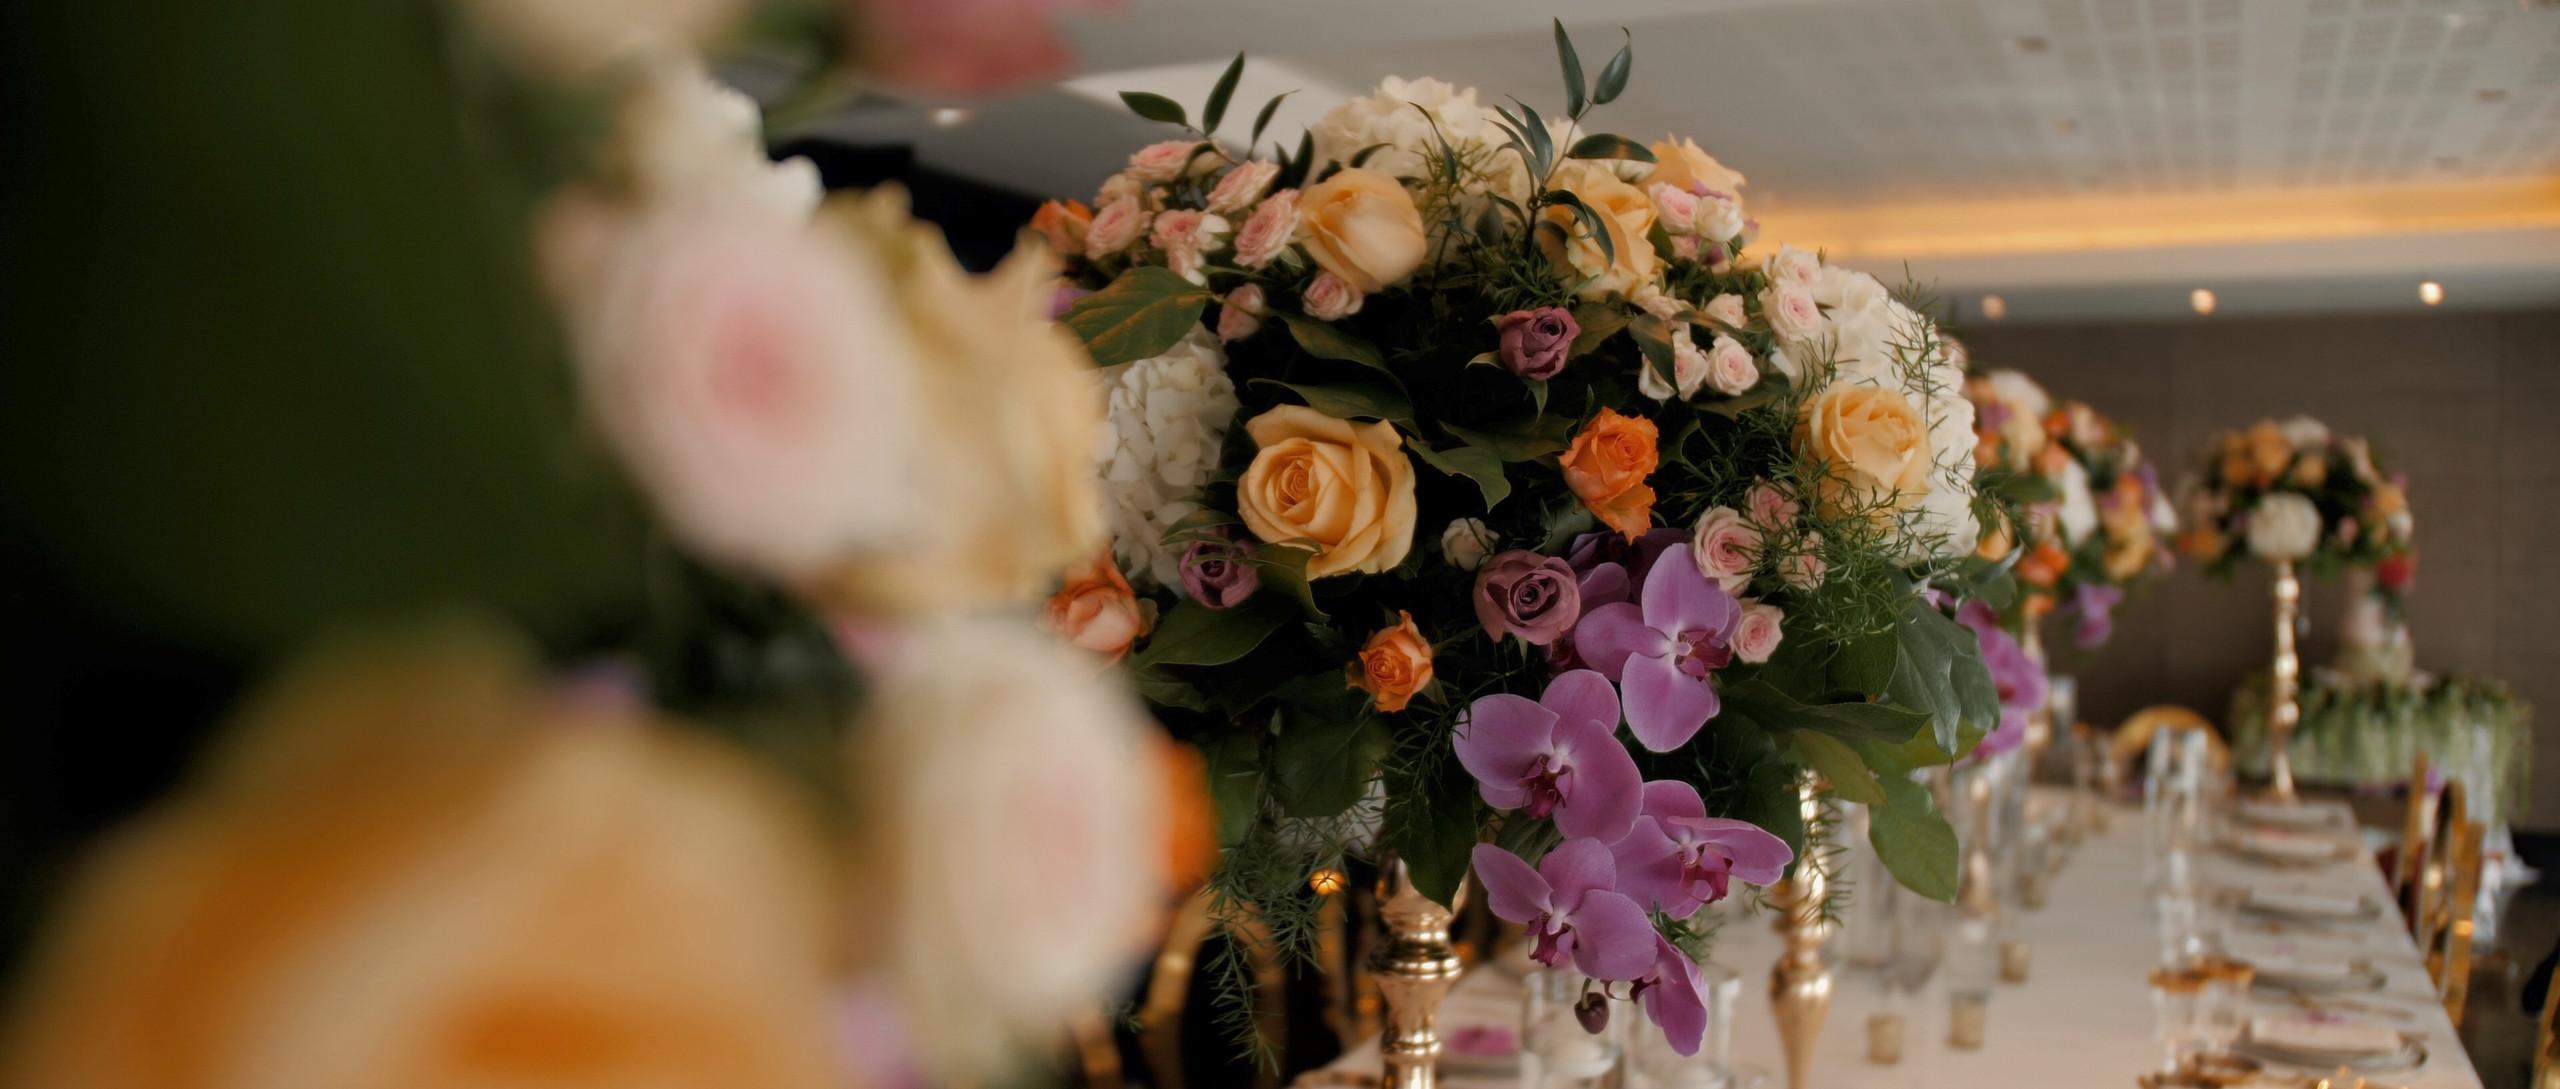 Table flowers aloha london wedding films videographer